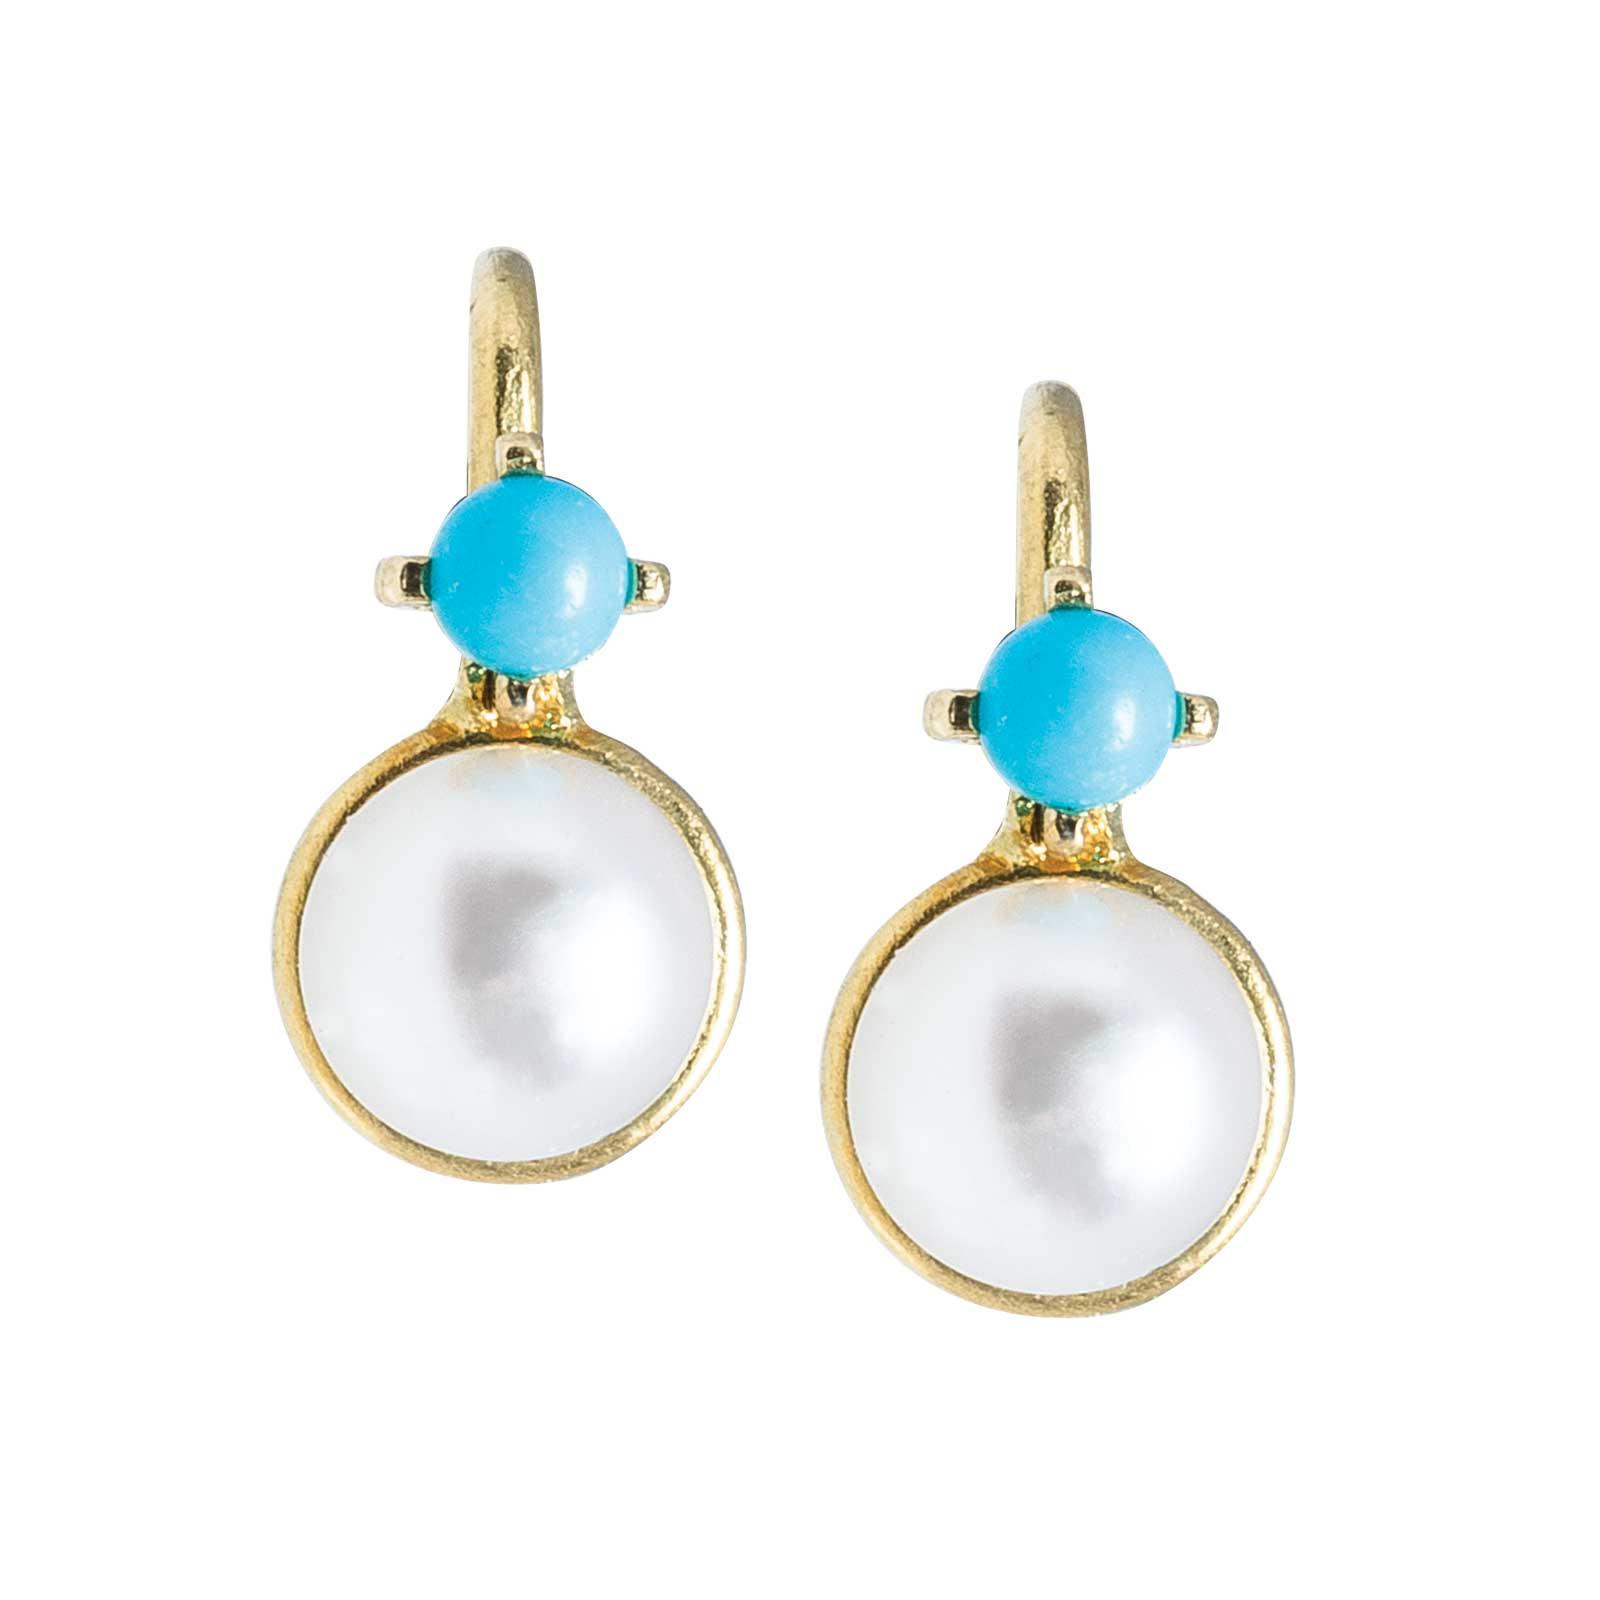 Vintage Cultured Pearl & Turquoise Earrings